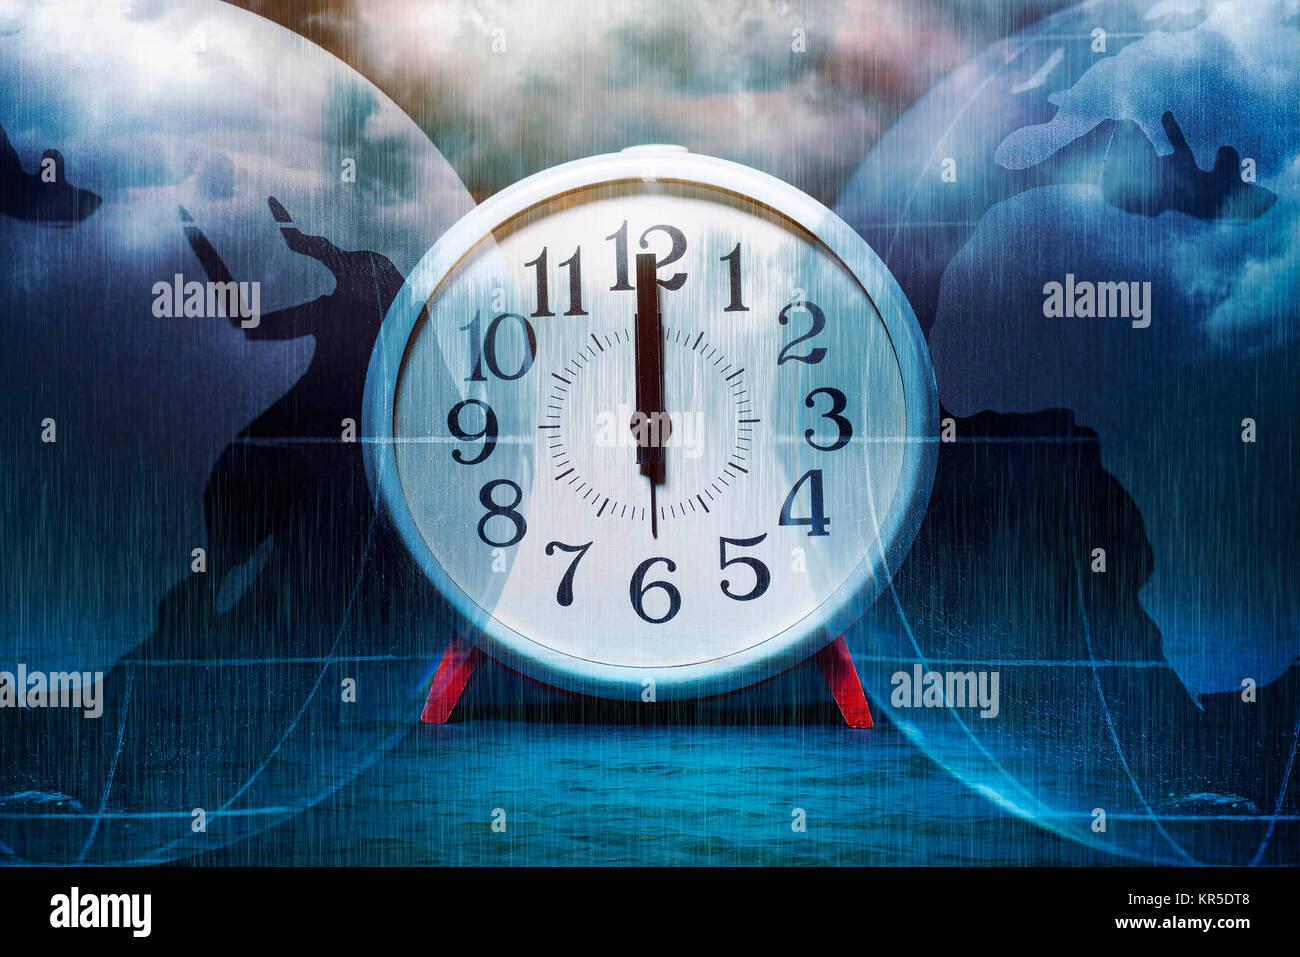 Alarm clock on 12 o'clock and globe, symbolic photo climate change, Wecker auf 12 Uhr und Erdkugel, Symbolfoto Klimawandel Stock Photo